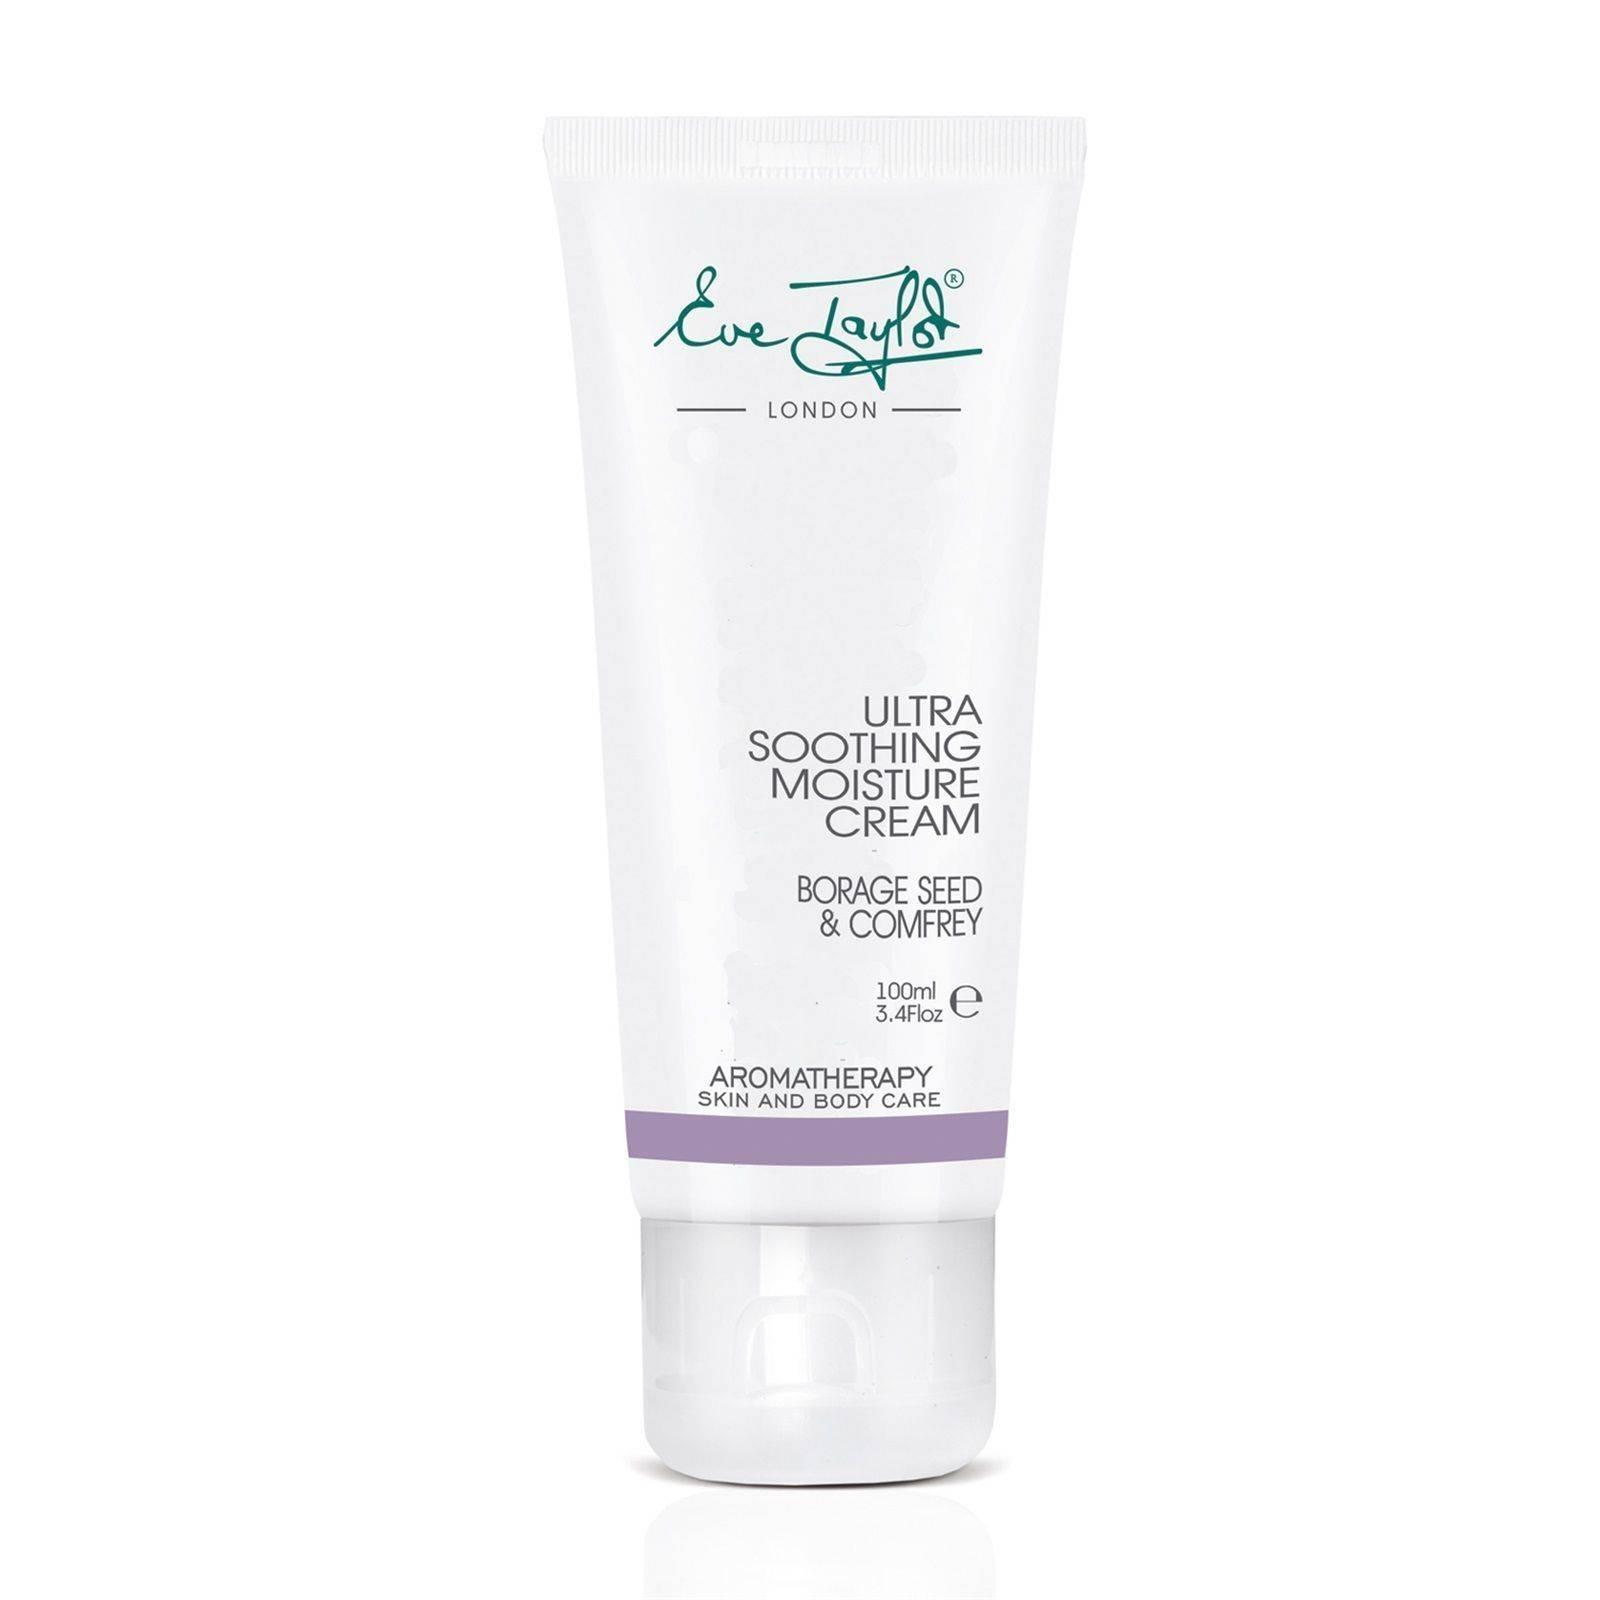 Ultra Soothing Moisture Cream 100ml